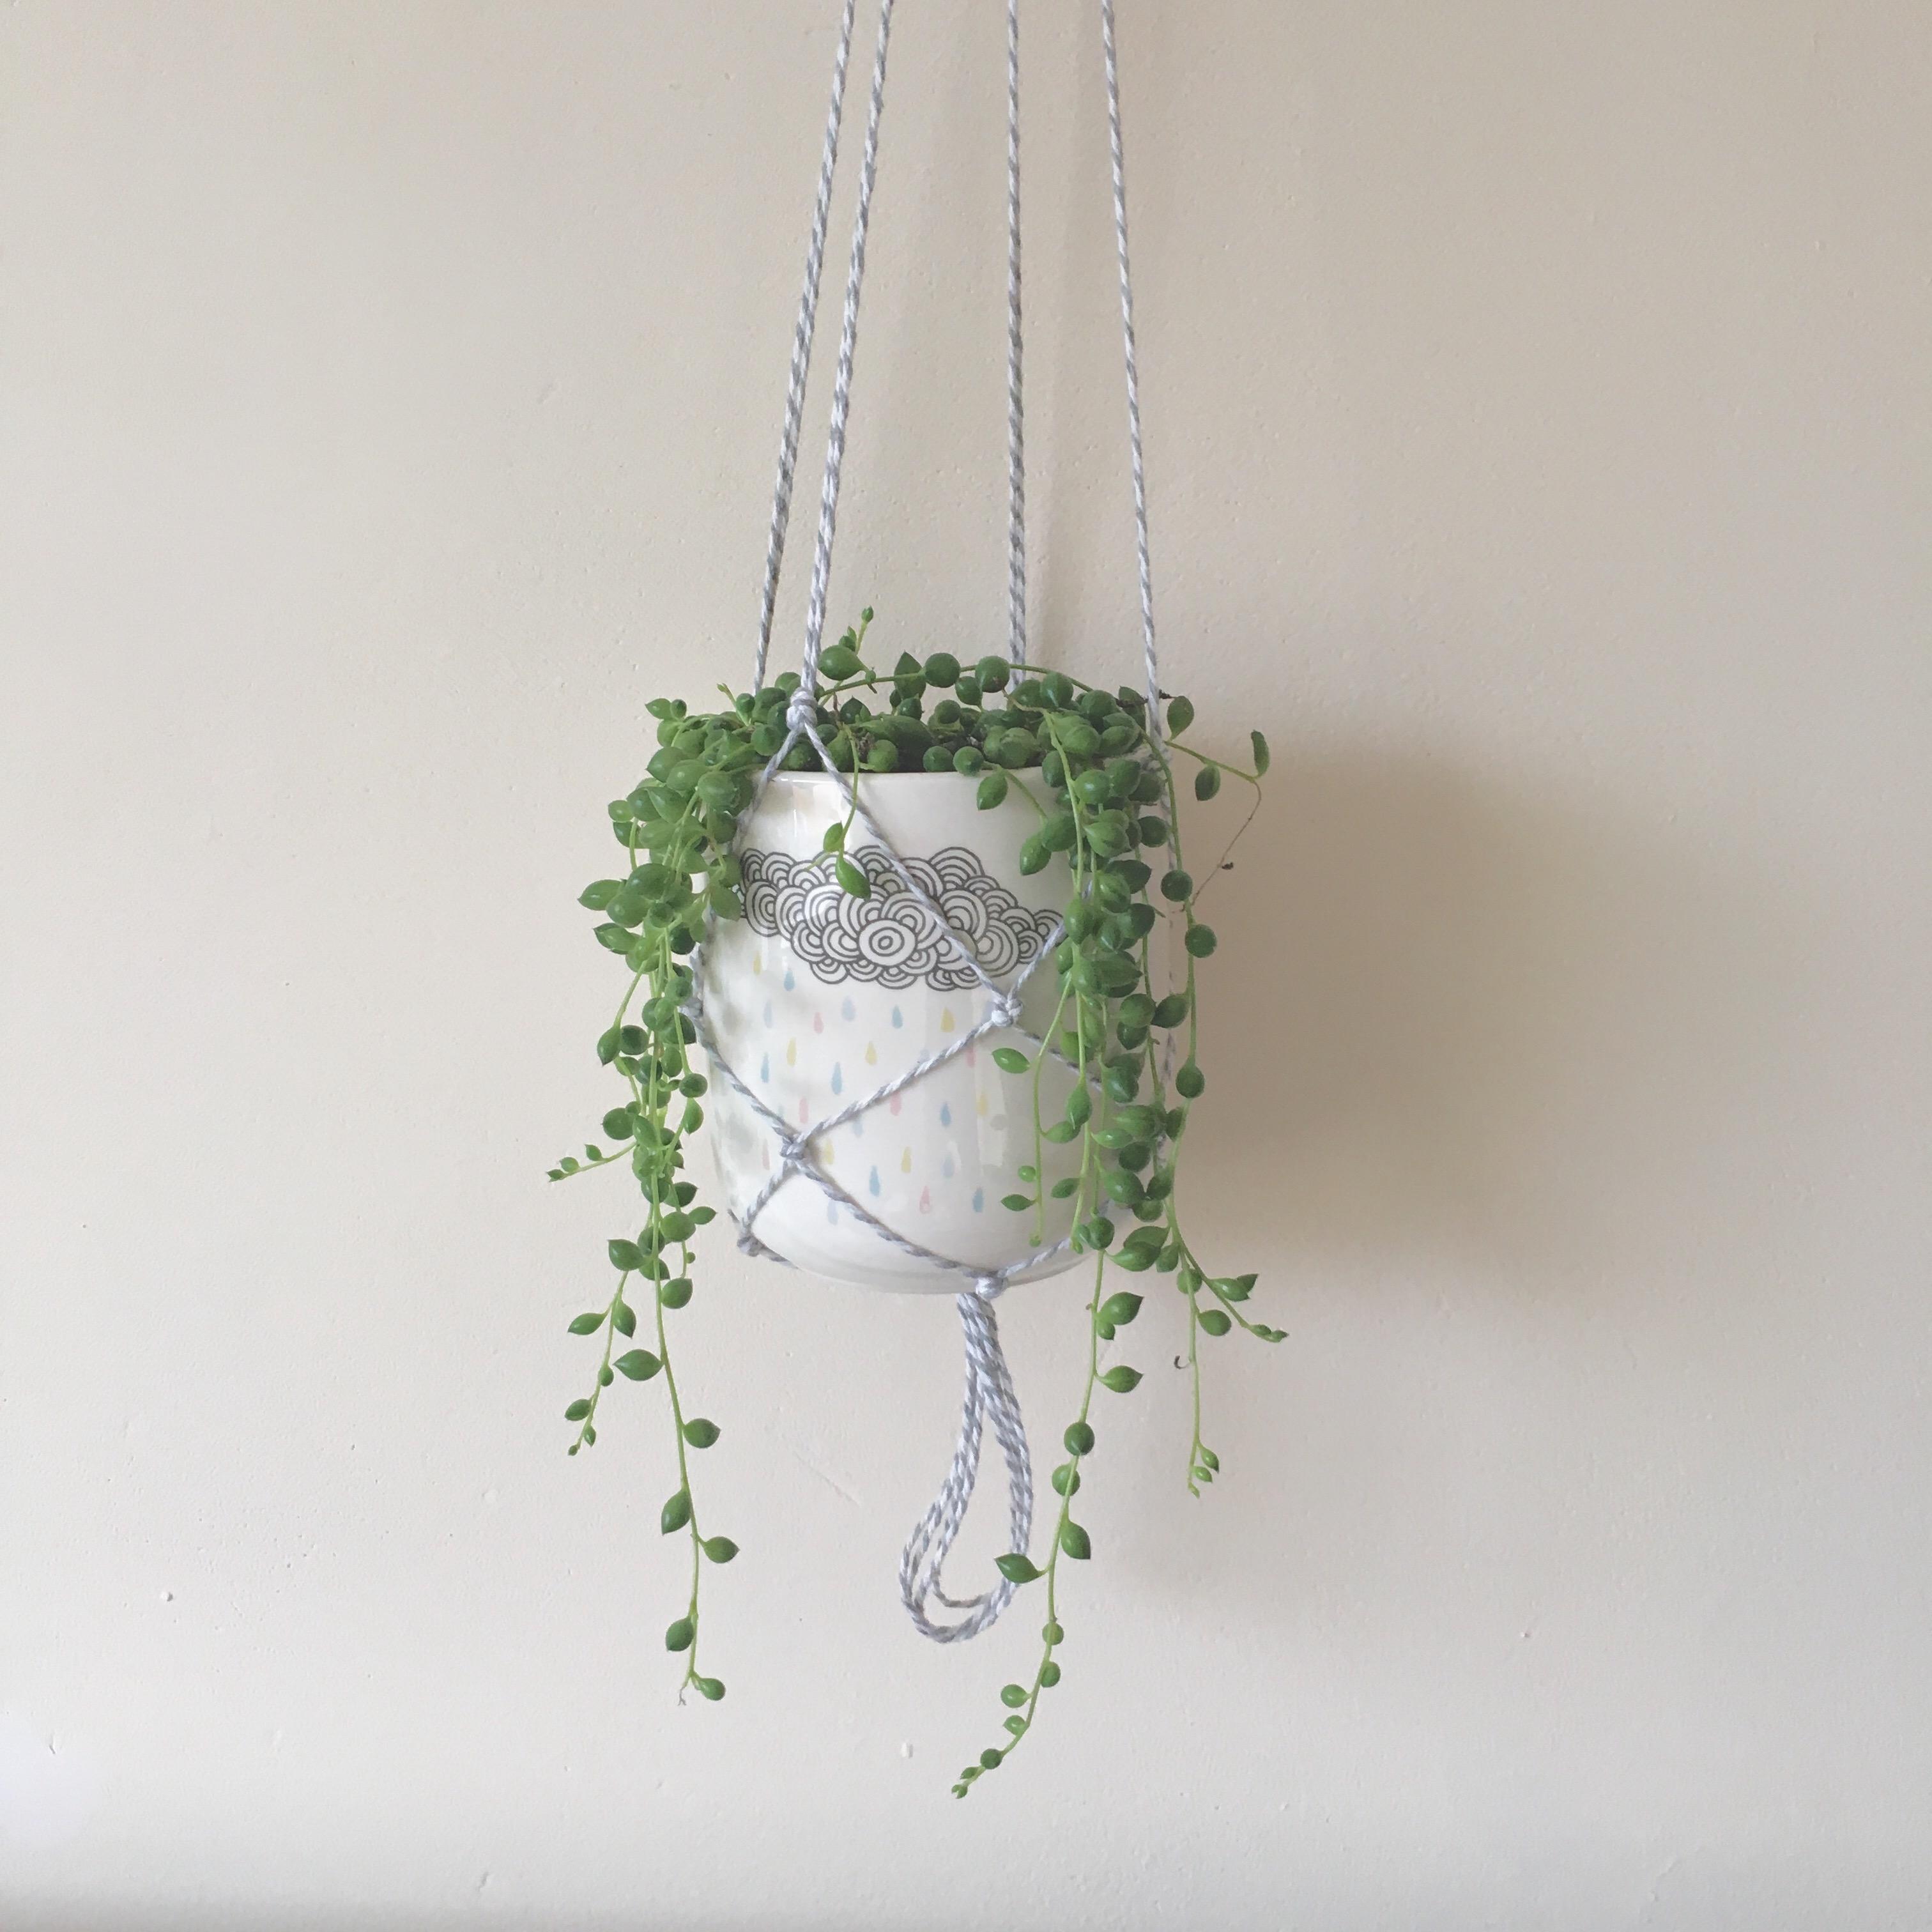 macrame plant hanger diy u2013 bugs and birds blog